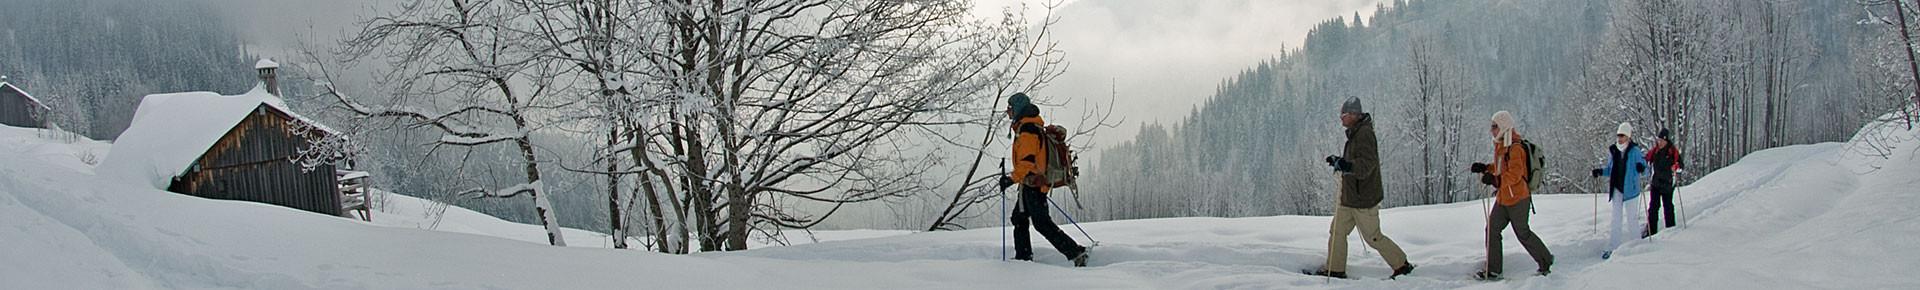 activites-d-hiver-en-vallee-d-aulps-1804-2828